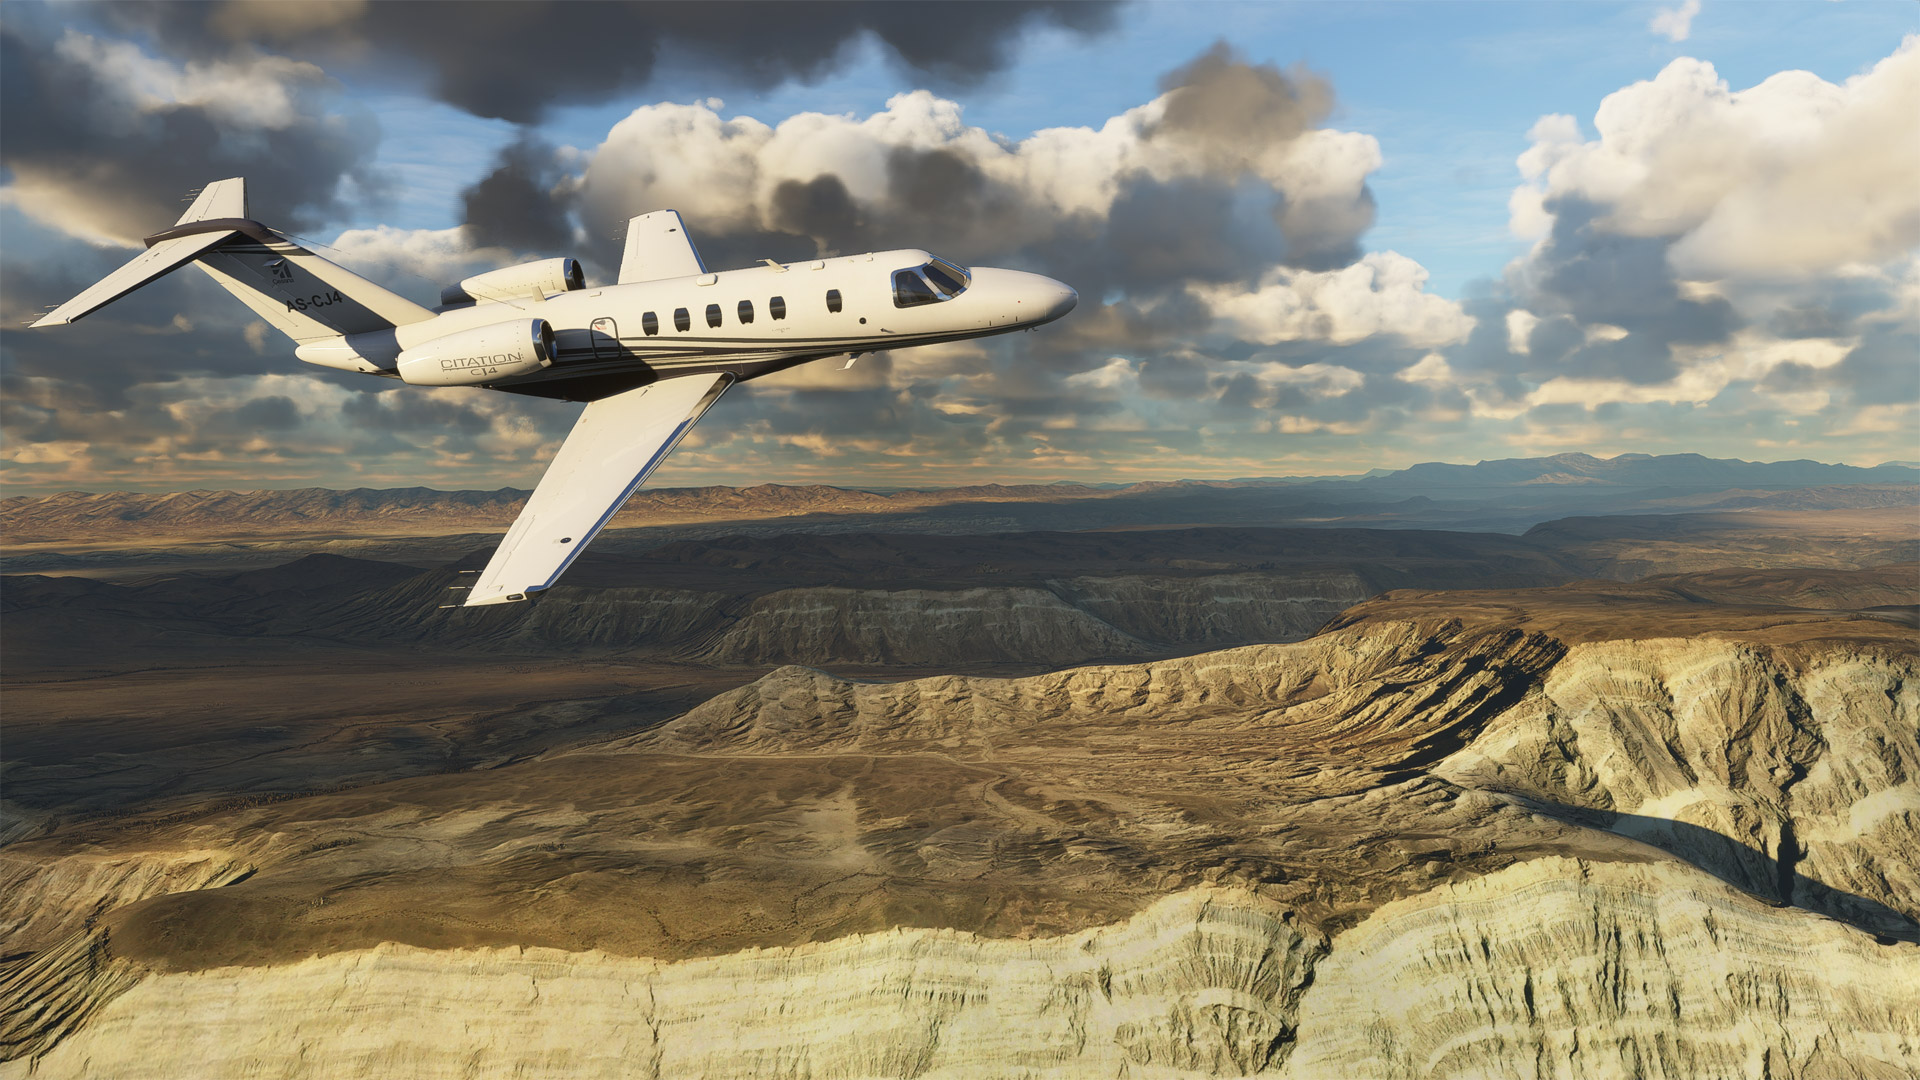 microsoft flight simulator computer wallpaper 72755